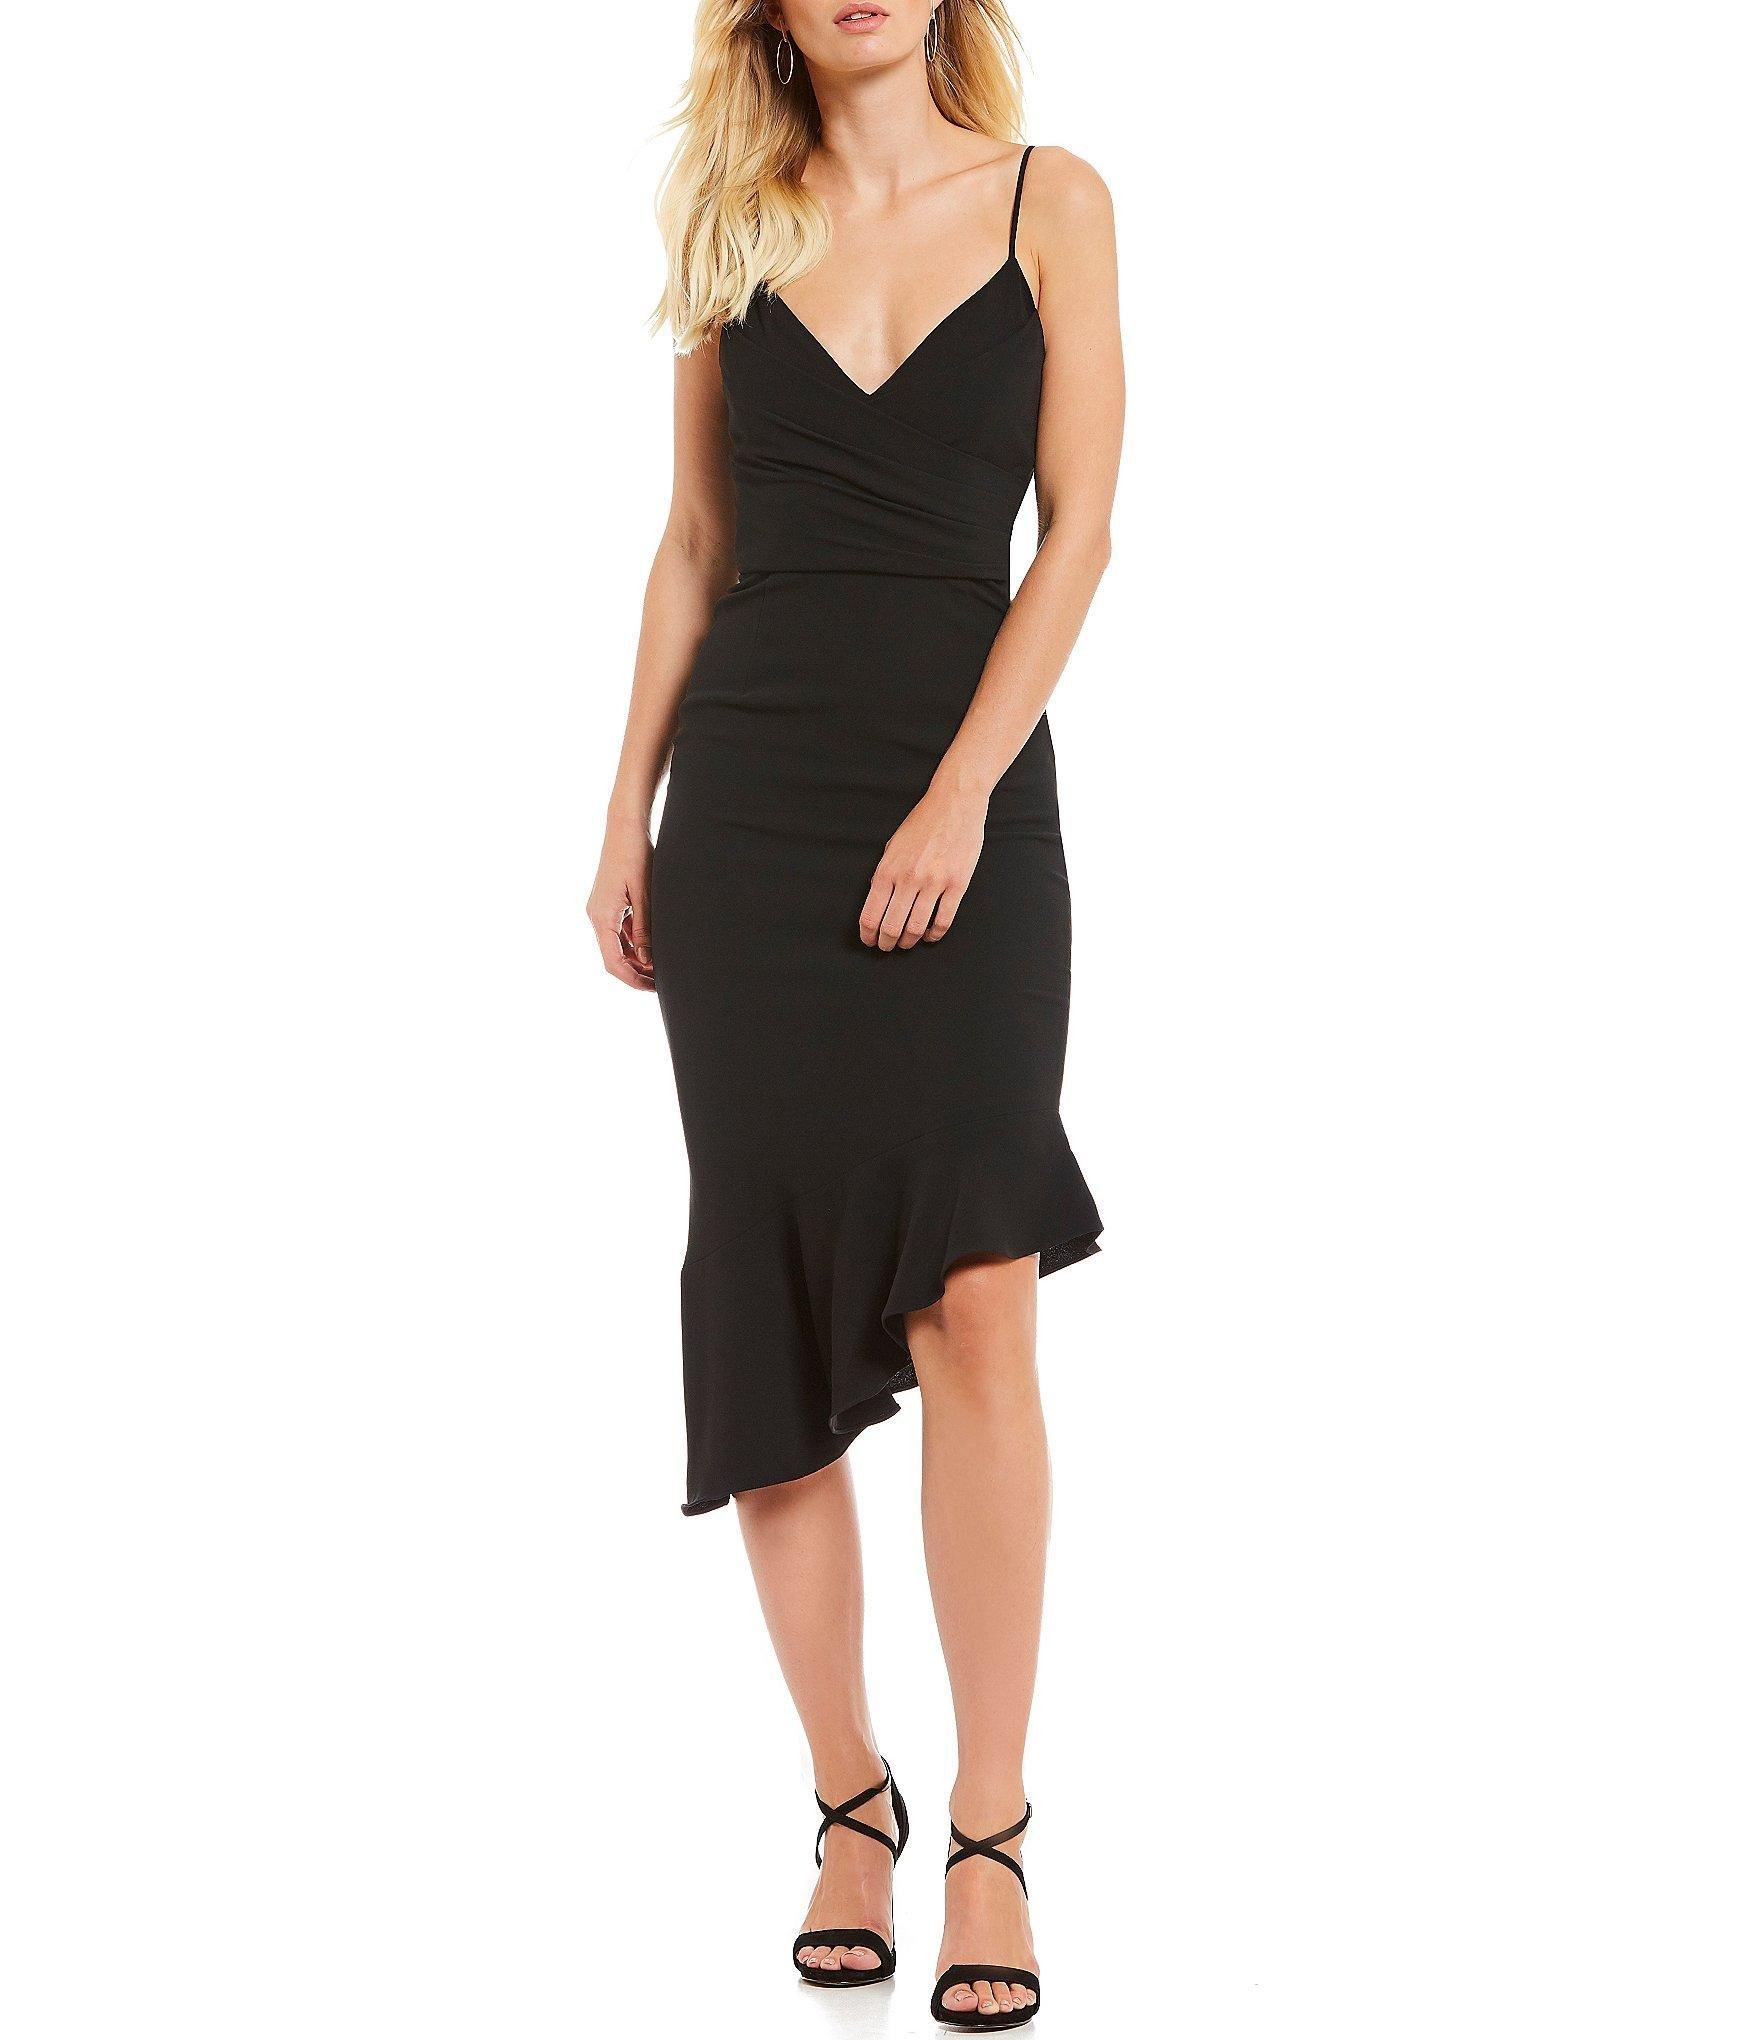 ecfdc41d8f Gianni Bini. Women s Black Lee V-neck Spaghetti Strap Fluted Asymmetric Hem  Midi Sheath Dress